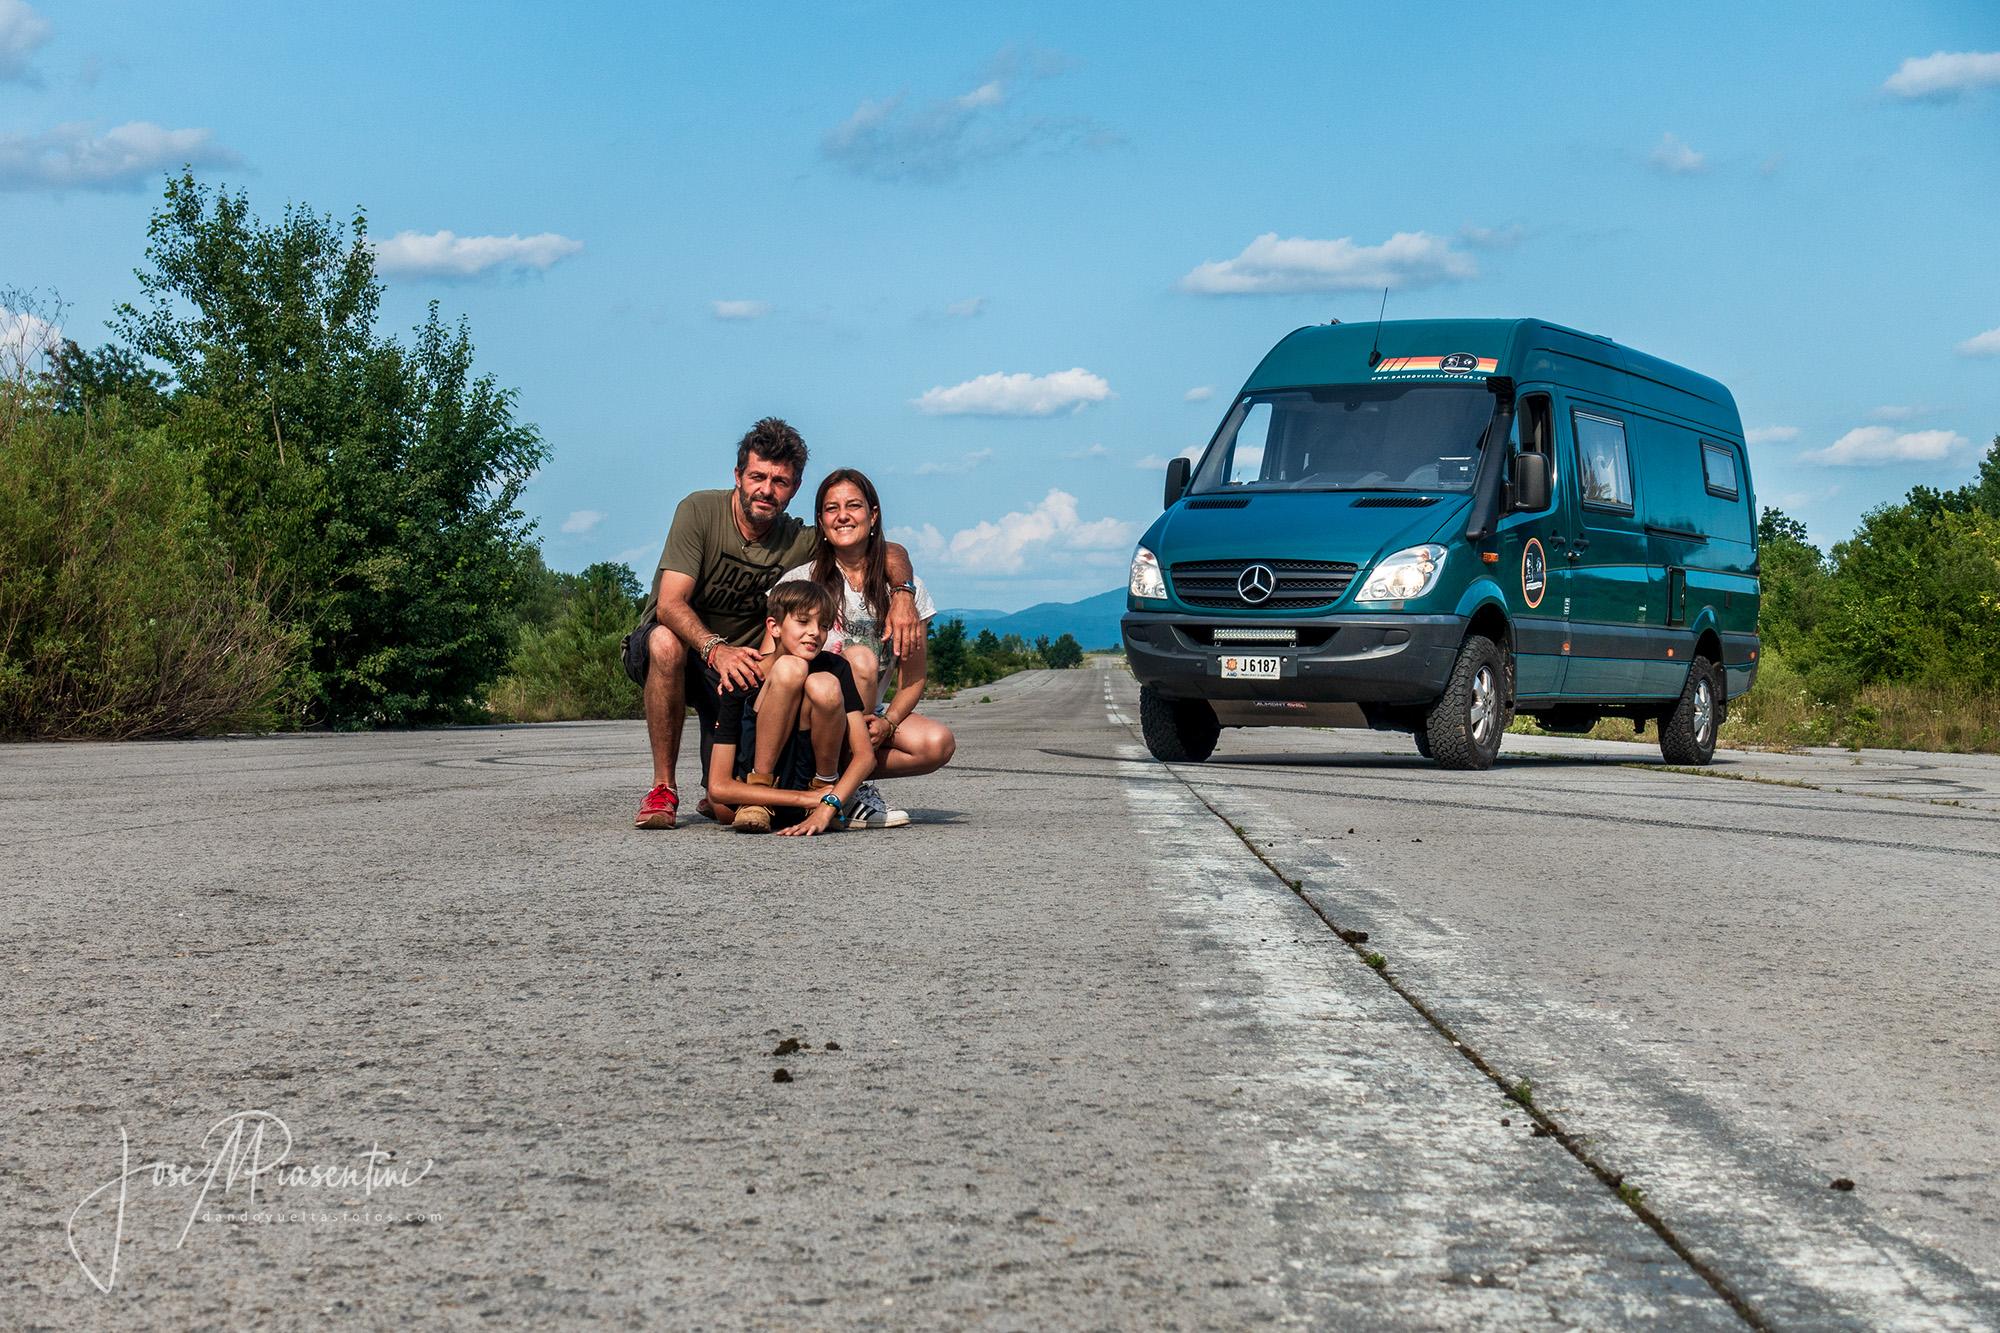 Militar base Zeljava in Croatia